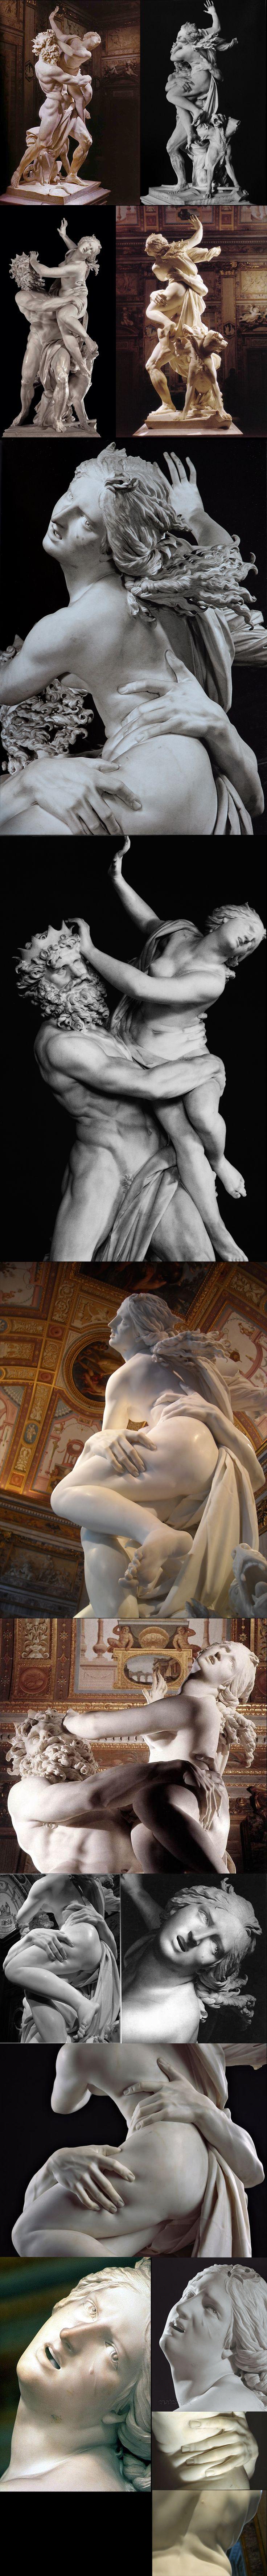 Lorenzo Bernini Pluton & Persefone. 1622. Galleria Borghese, Rome POne of the greatest work of Art in the world.